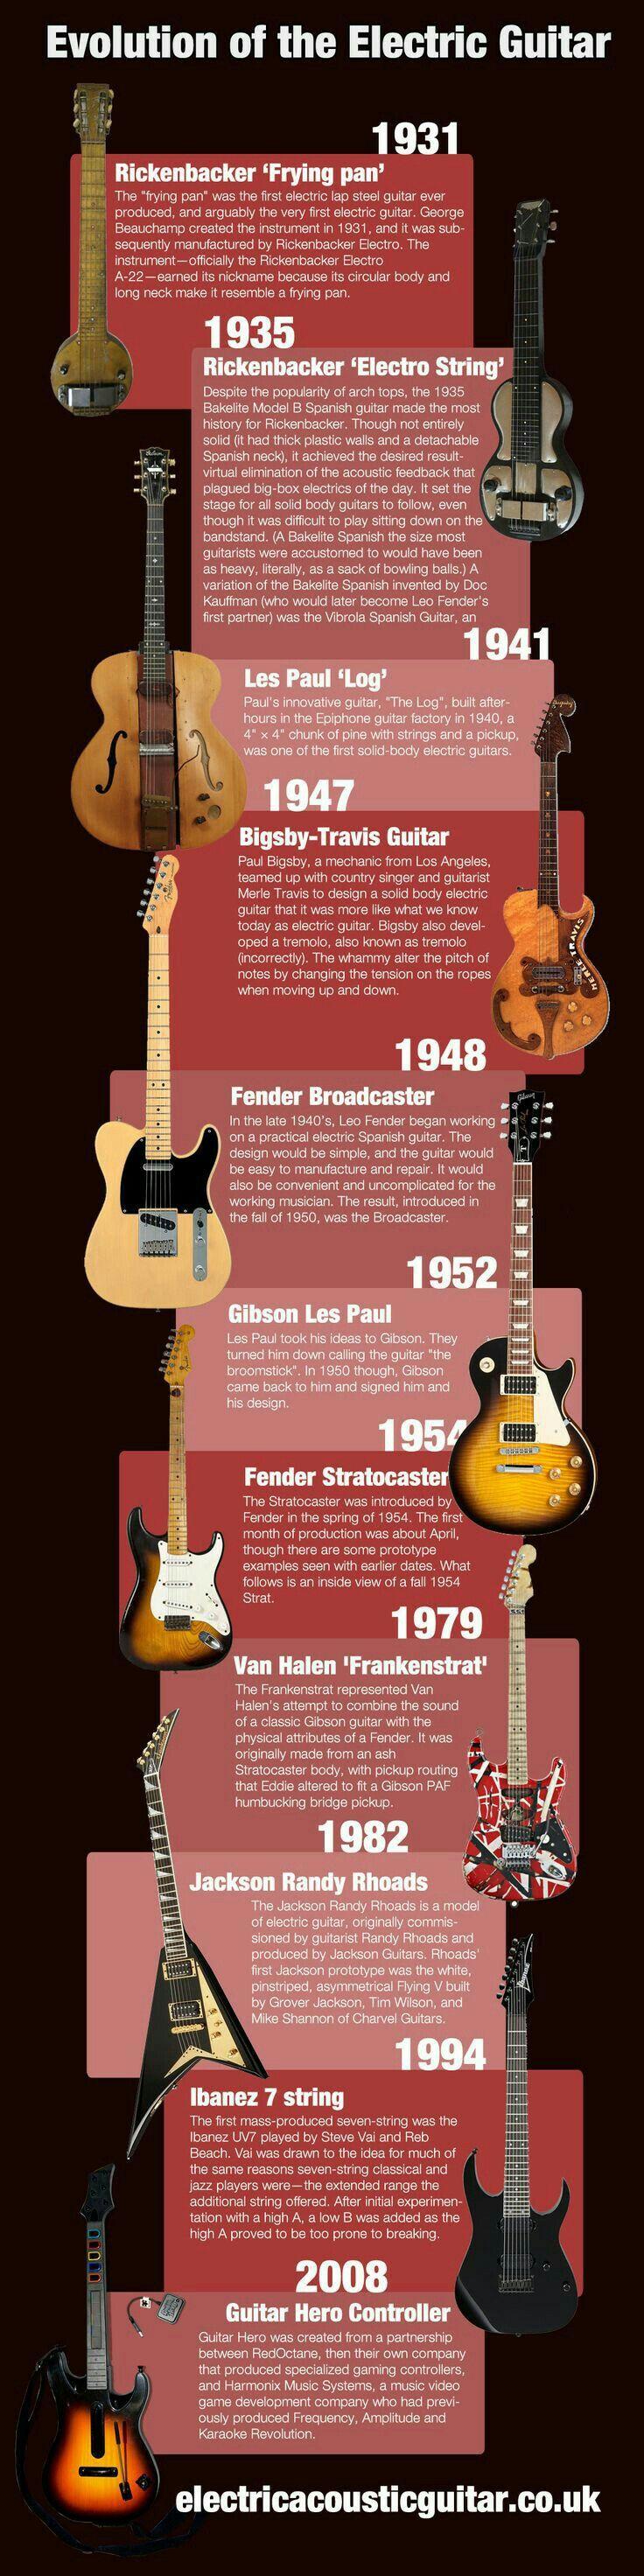 E gitarren Zum über Dem Neueste Musik Frying Pans Music Promotion The Evolution